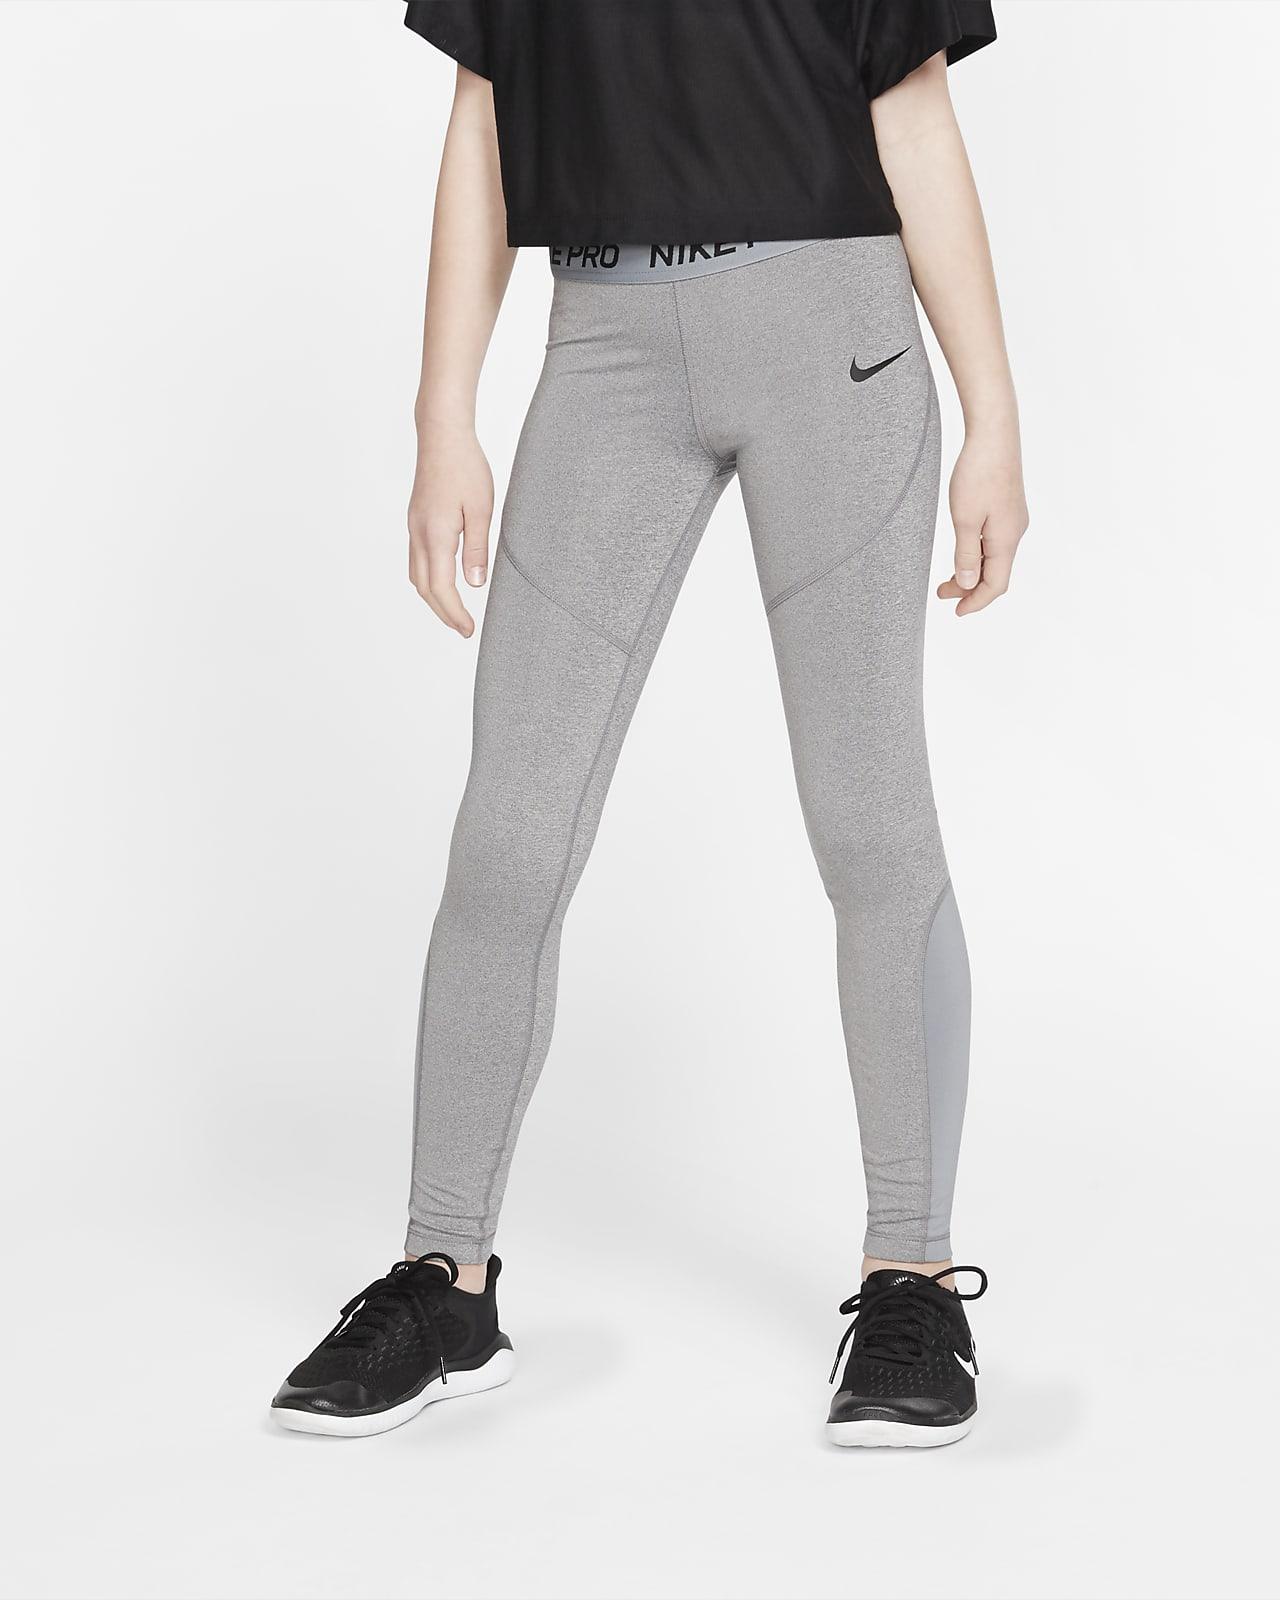 Nike Pro Tights für ältere Kinder (Mädchen)